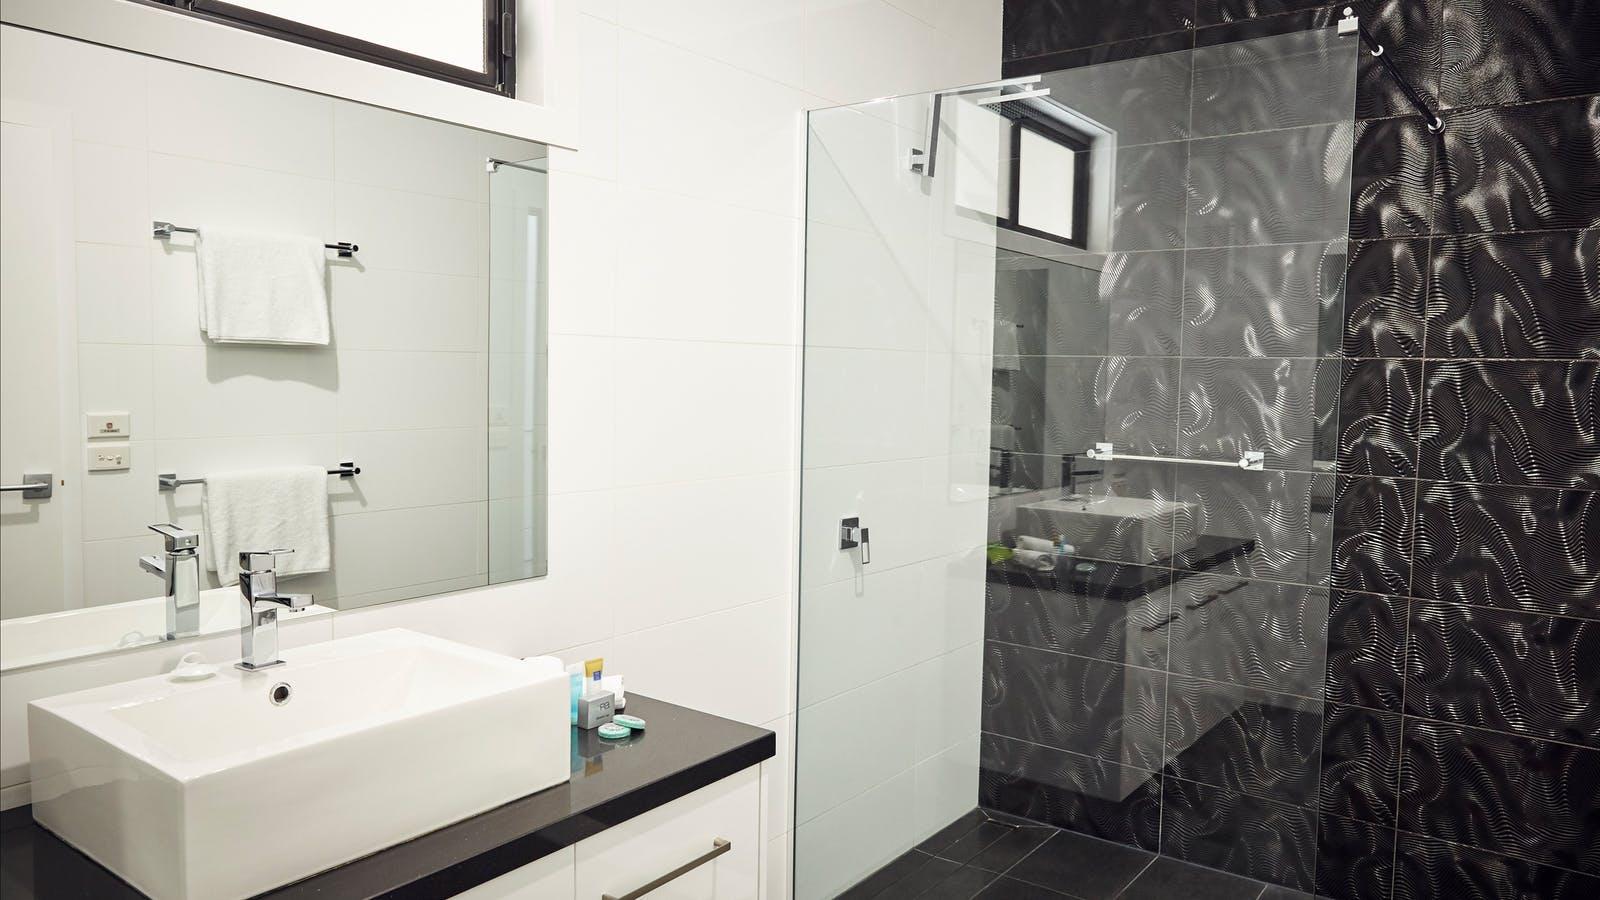 Room 18 Bathroom - Premier King Room at Junction Motel, Maryborough